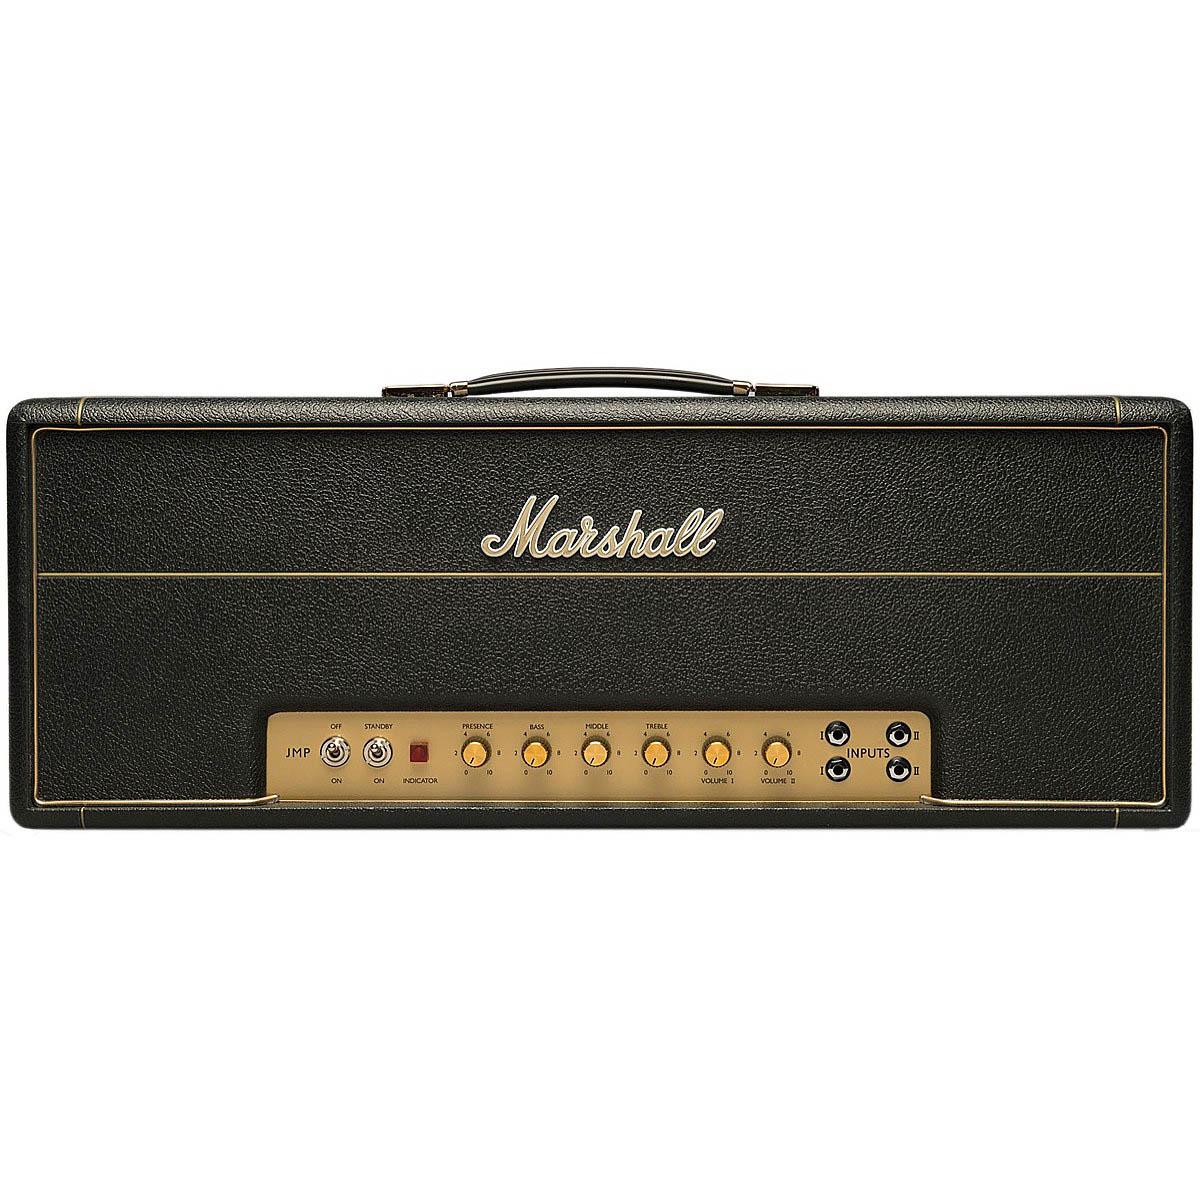 Marshall 1959HW Handwired Tube Guitar Head